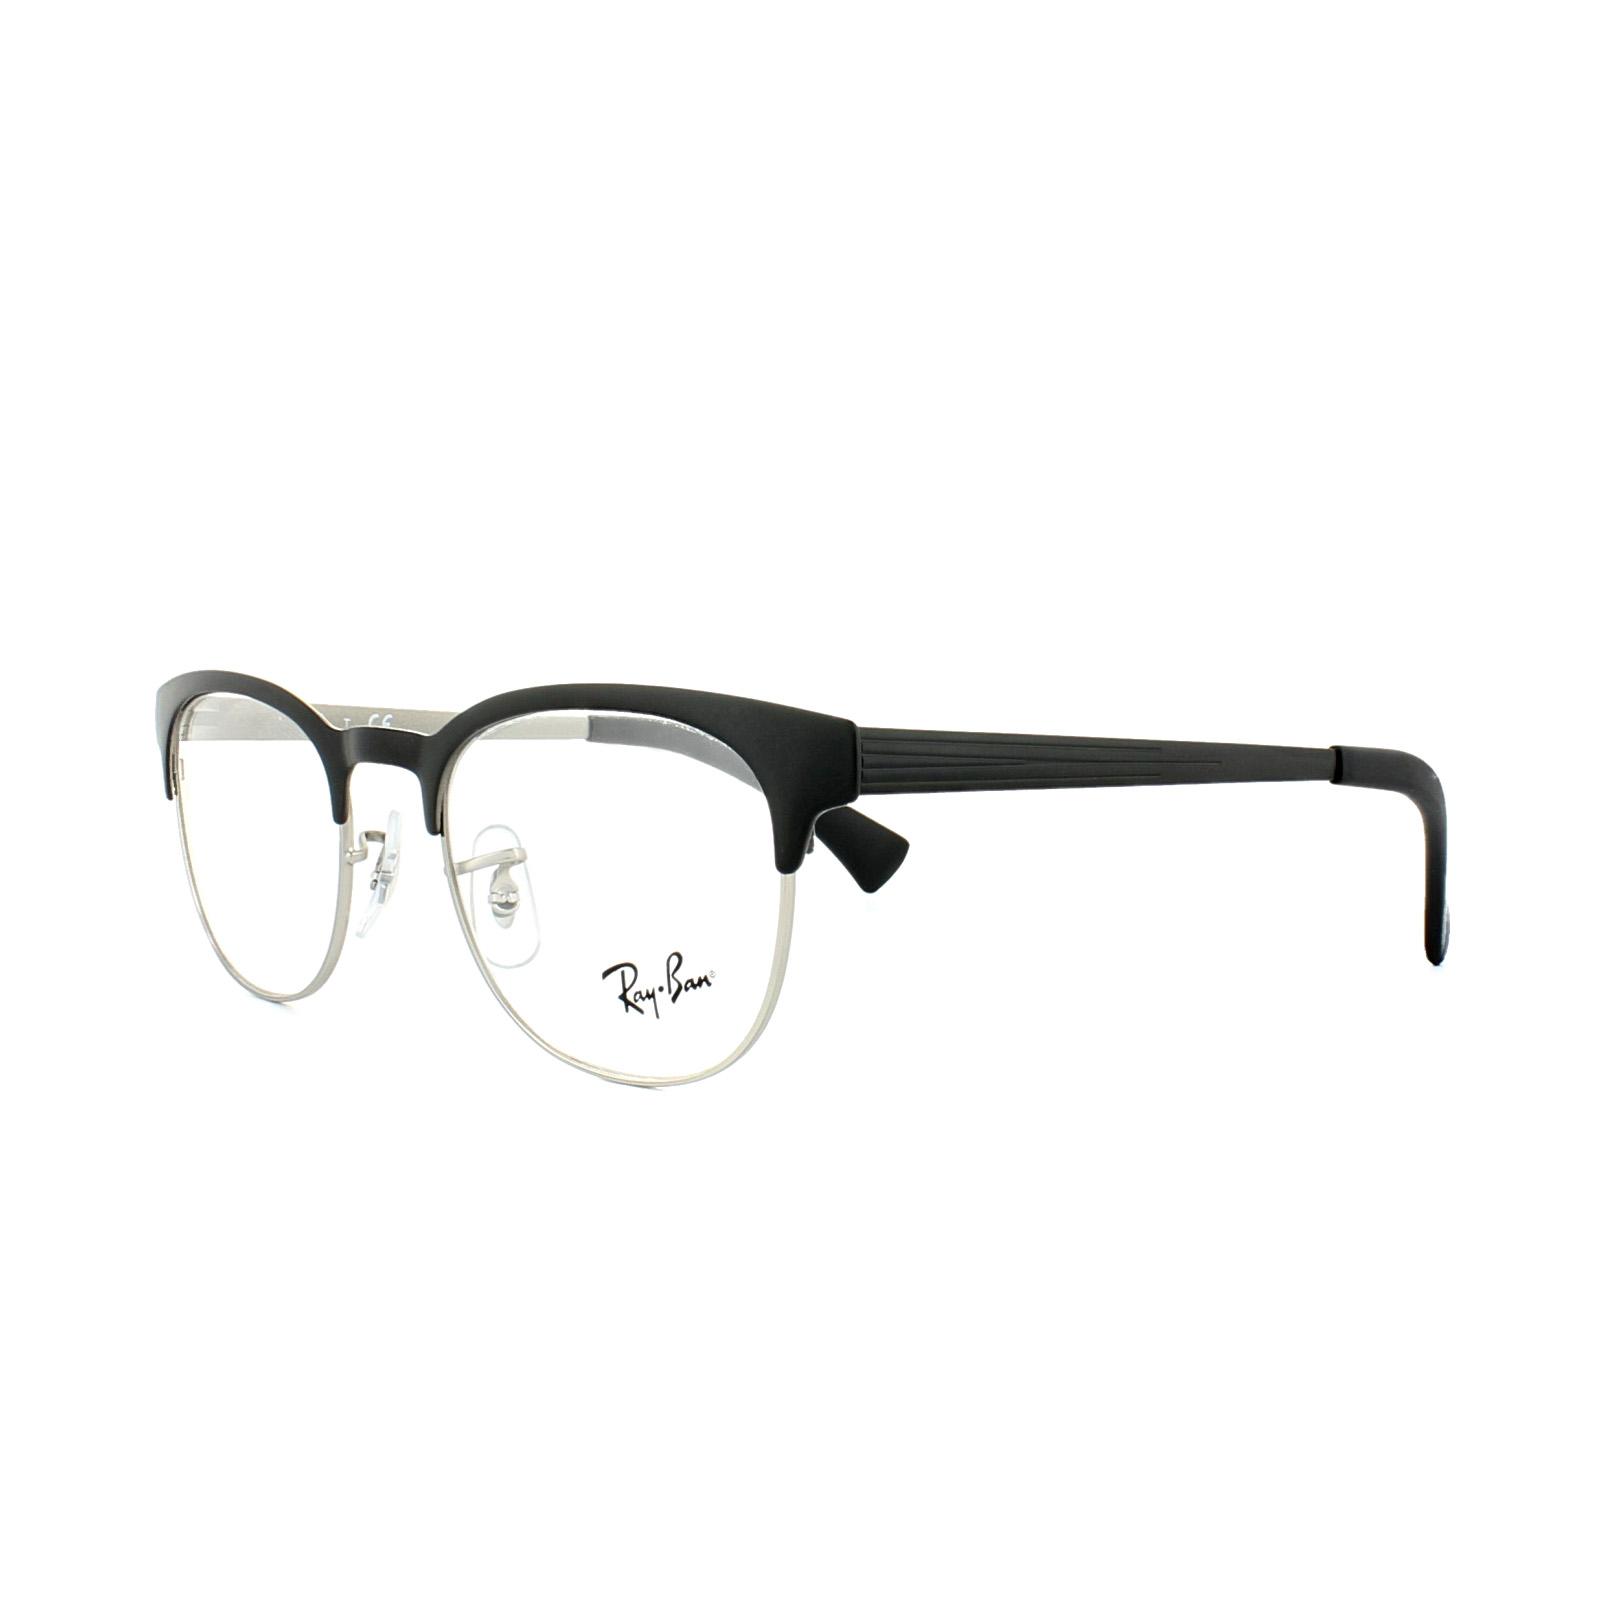 df0b16c86e2 Sentinel Ray-Ban Glasses Frames 6317 2832 Top Black on Matte Silver Mens  Womens 49mm